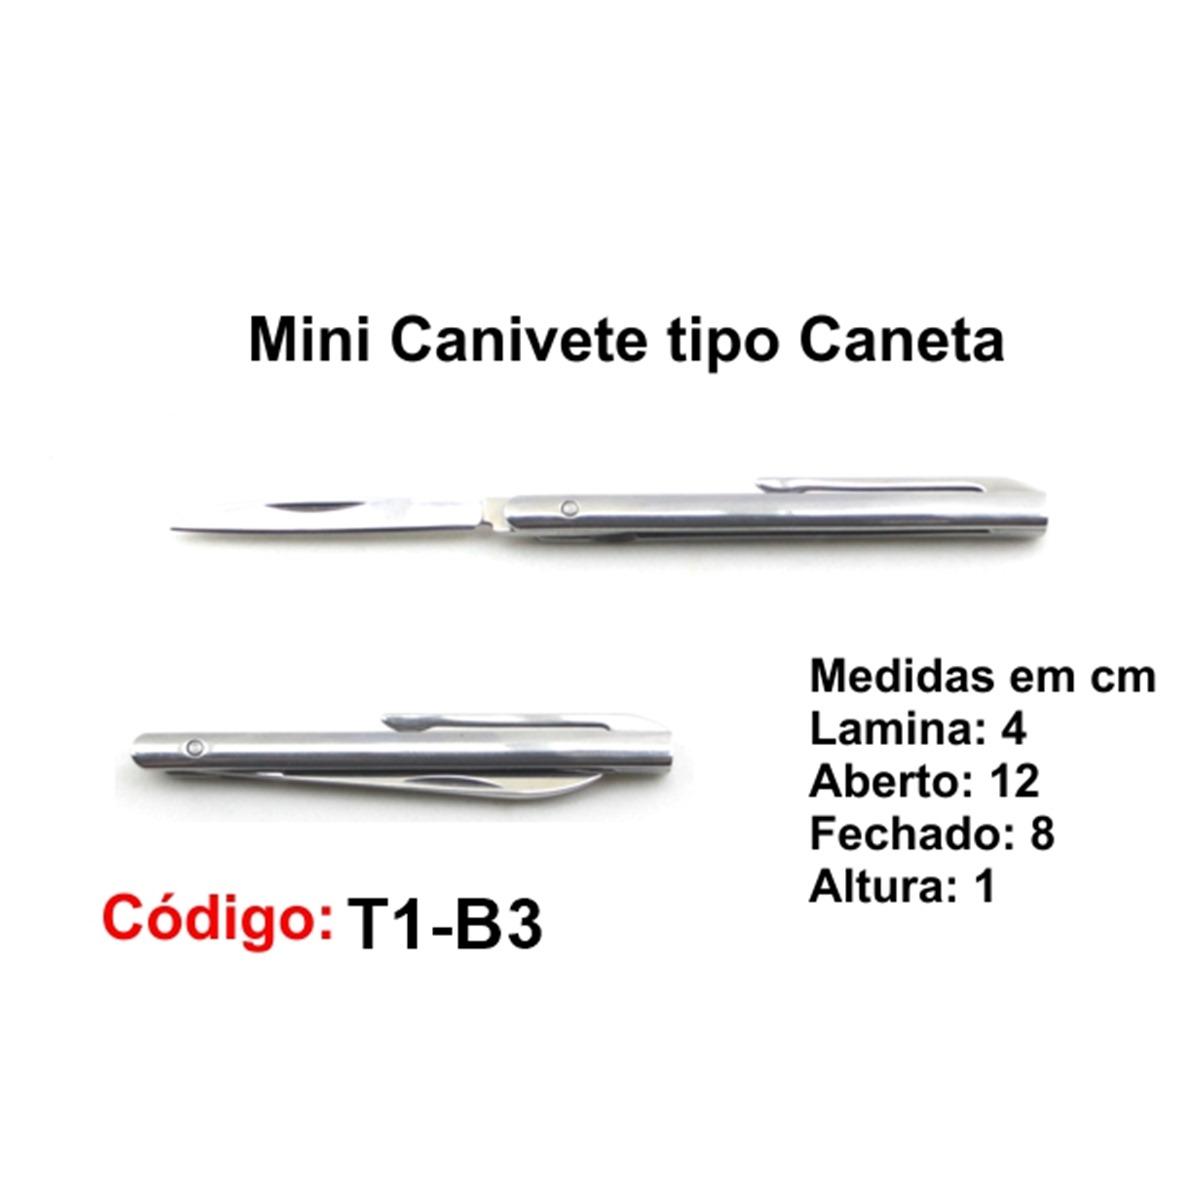 Mini Canivete Tipo Caneta T1-B3